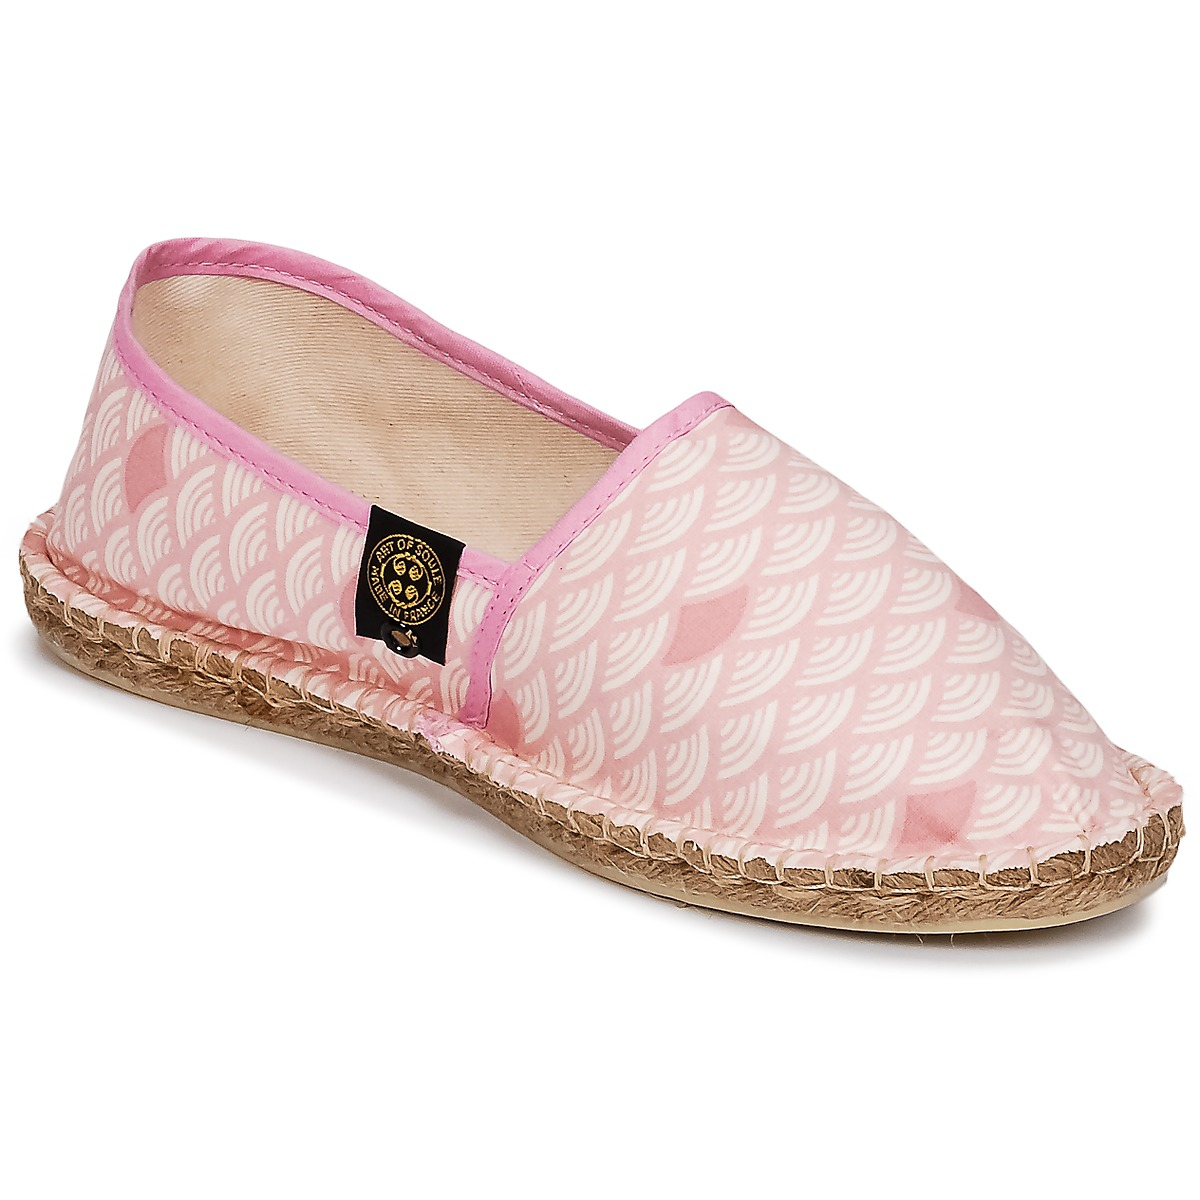 Art of Soule KAMAKURA Rose - Kostenloser Versand bei Spartoode ! - Schuhe Leinen-Pantoletten mit gefloch Damen 39,19 €